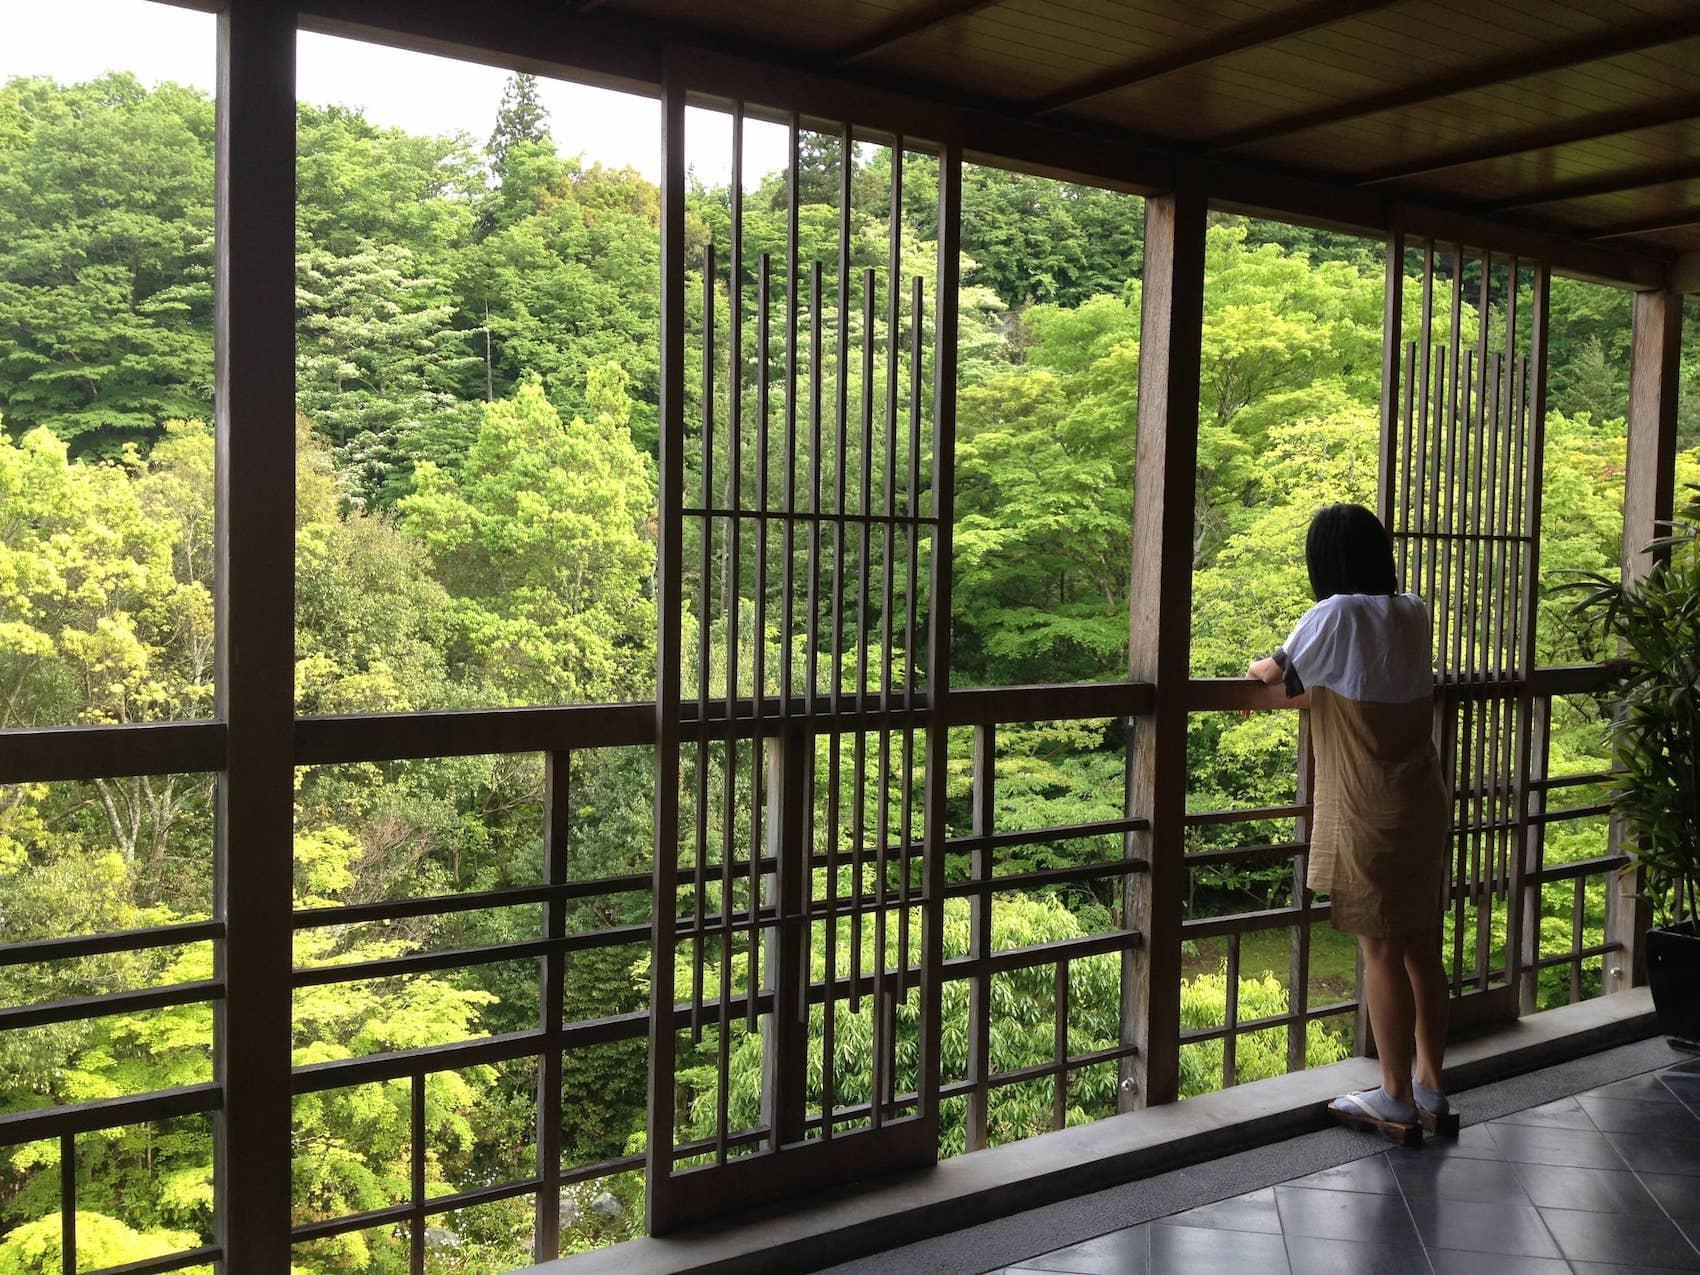 Kadan Ryokan - Viaggio di Nozze Giappone